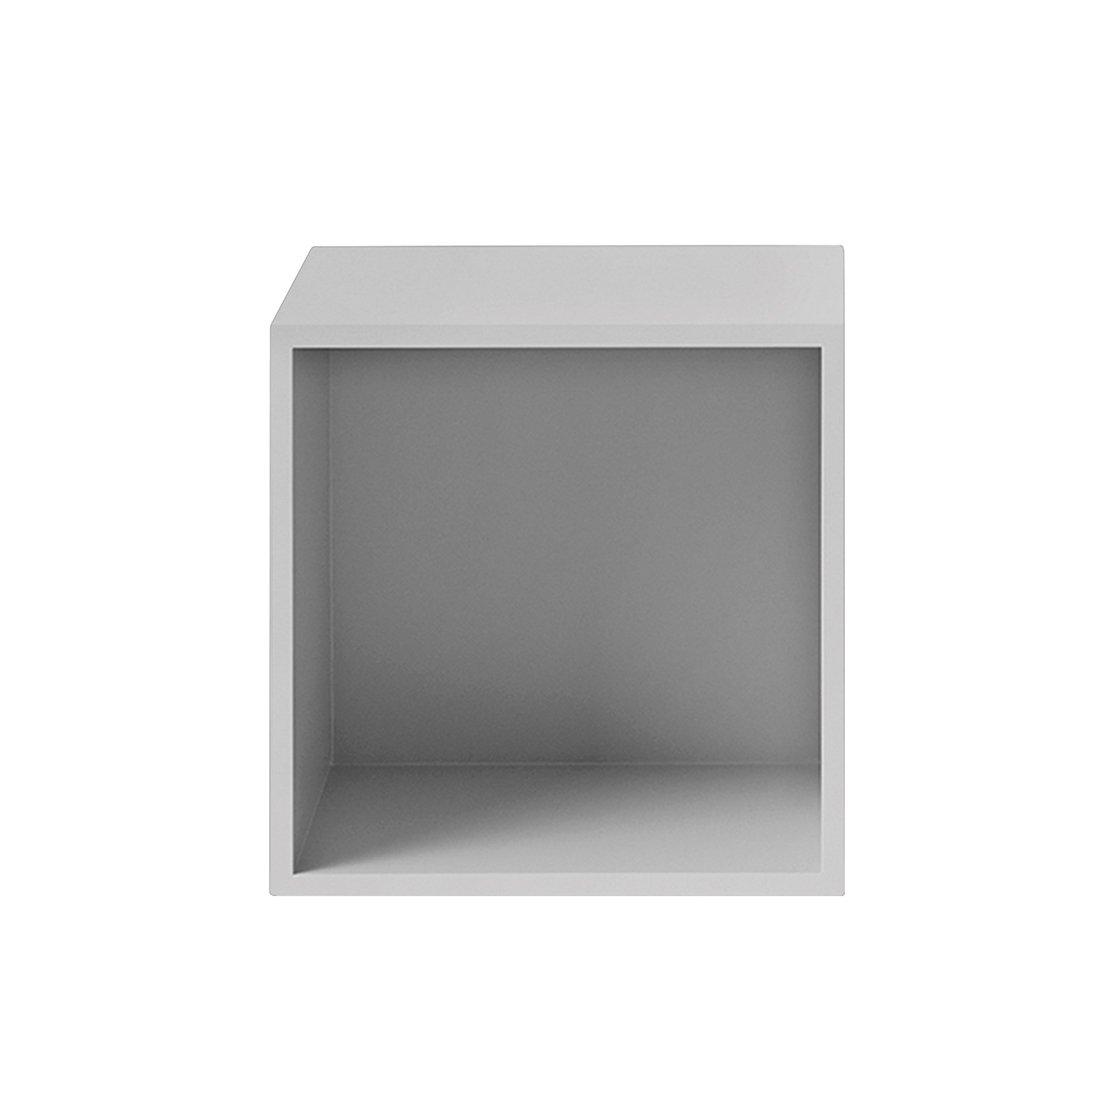 Muuto Stacked 2.0 Modules Medium Lichtgrijs/Dicht